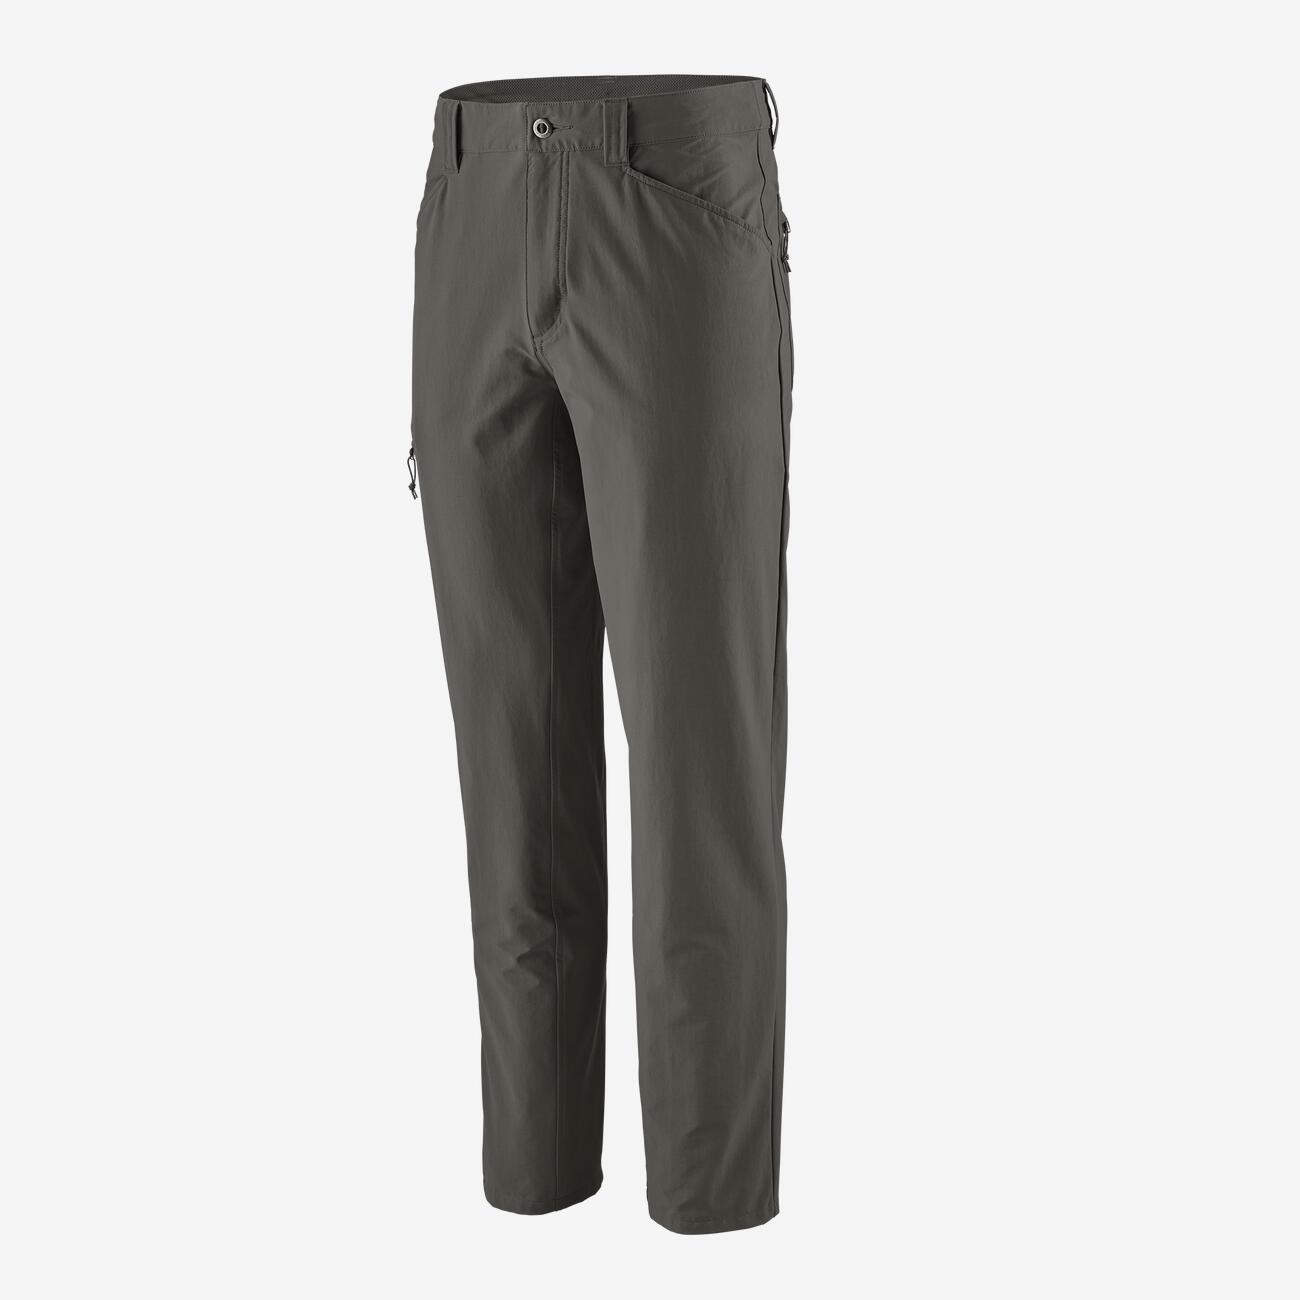 Men's Tall Pants